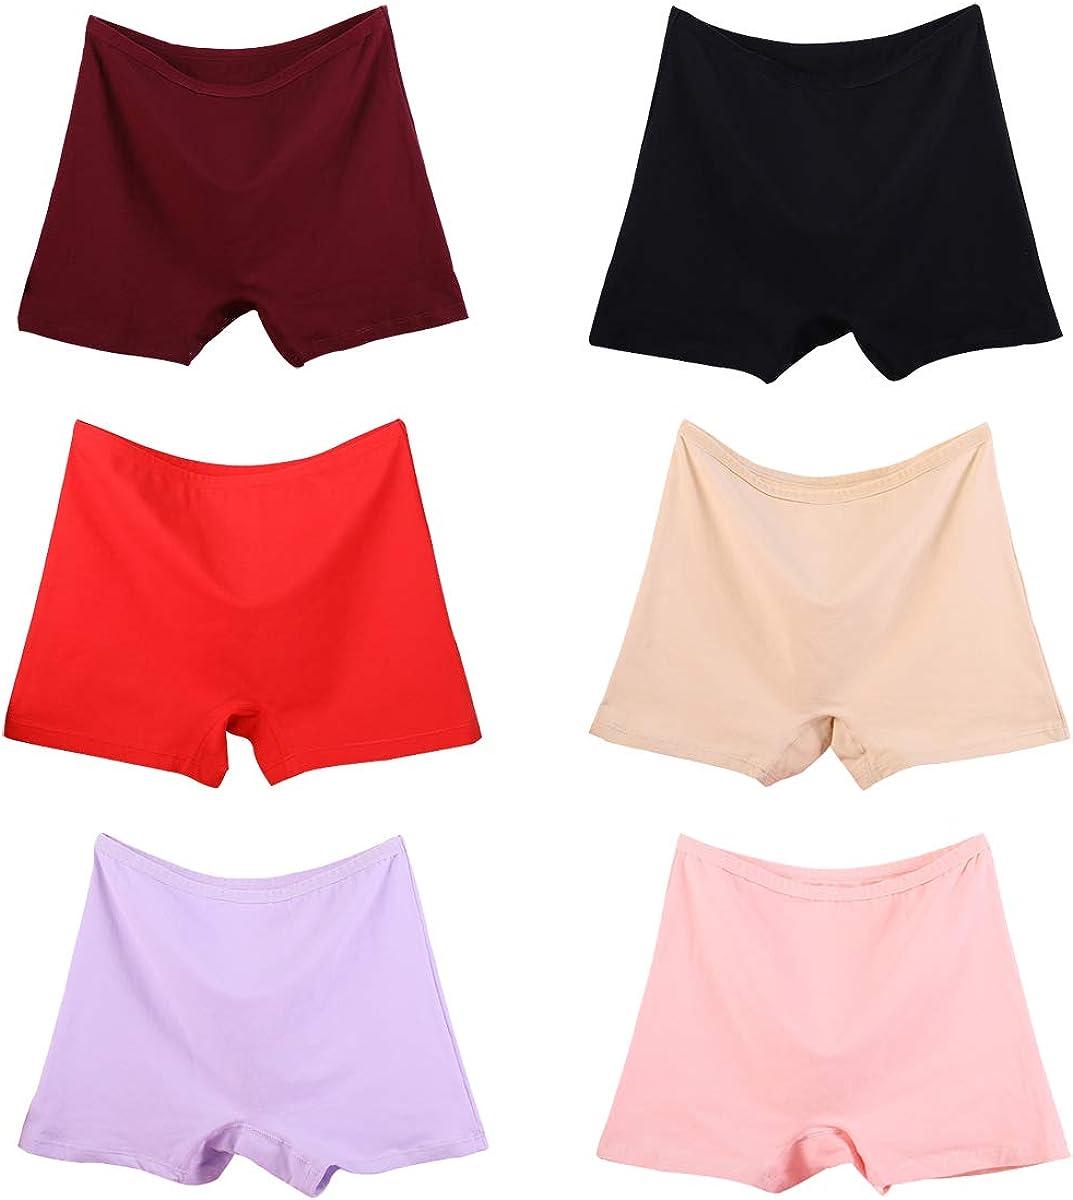 Cheap Boy Short Panties Pictures